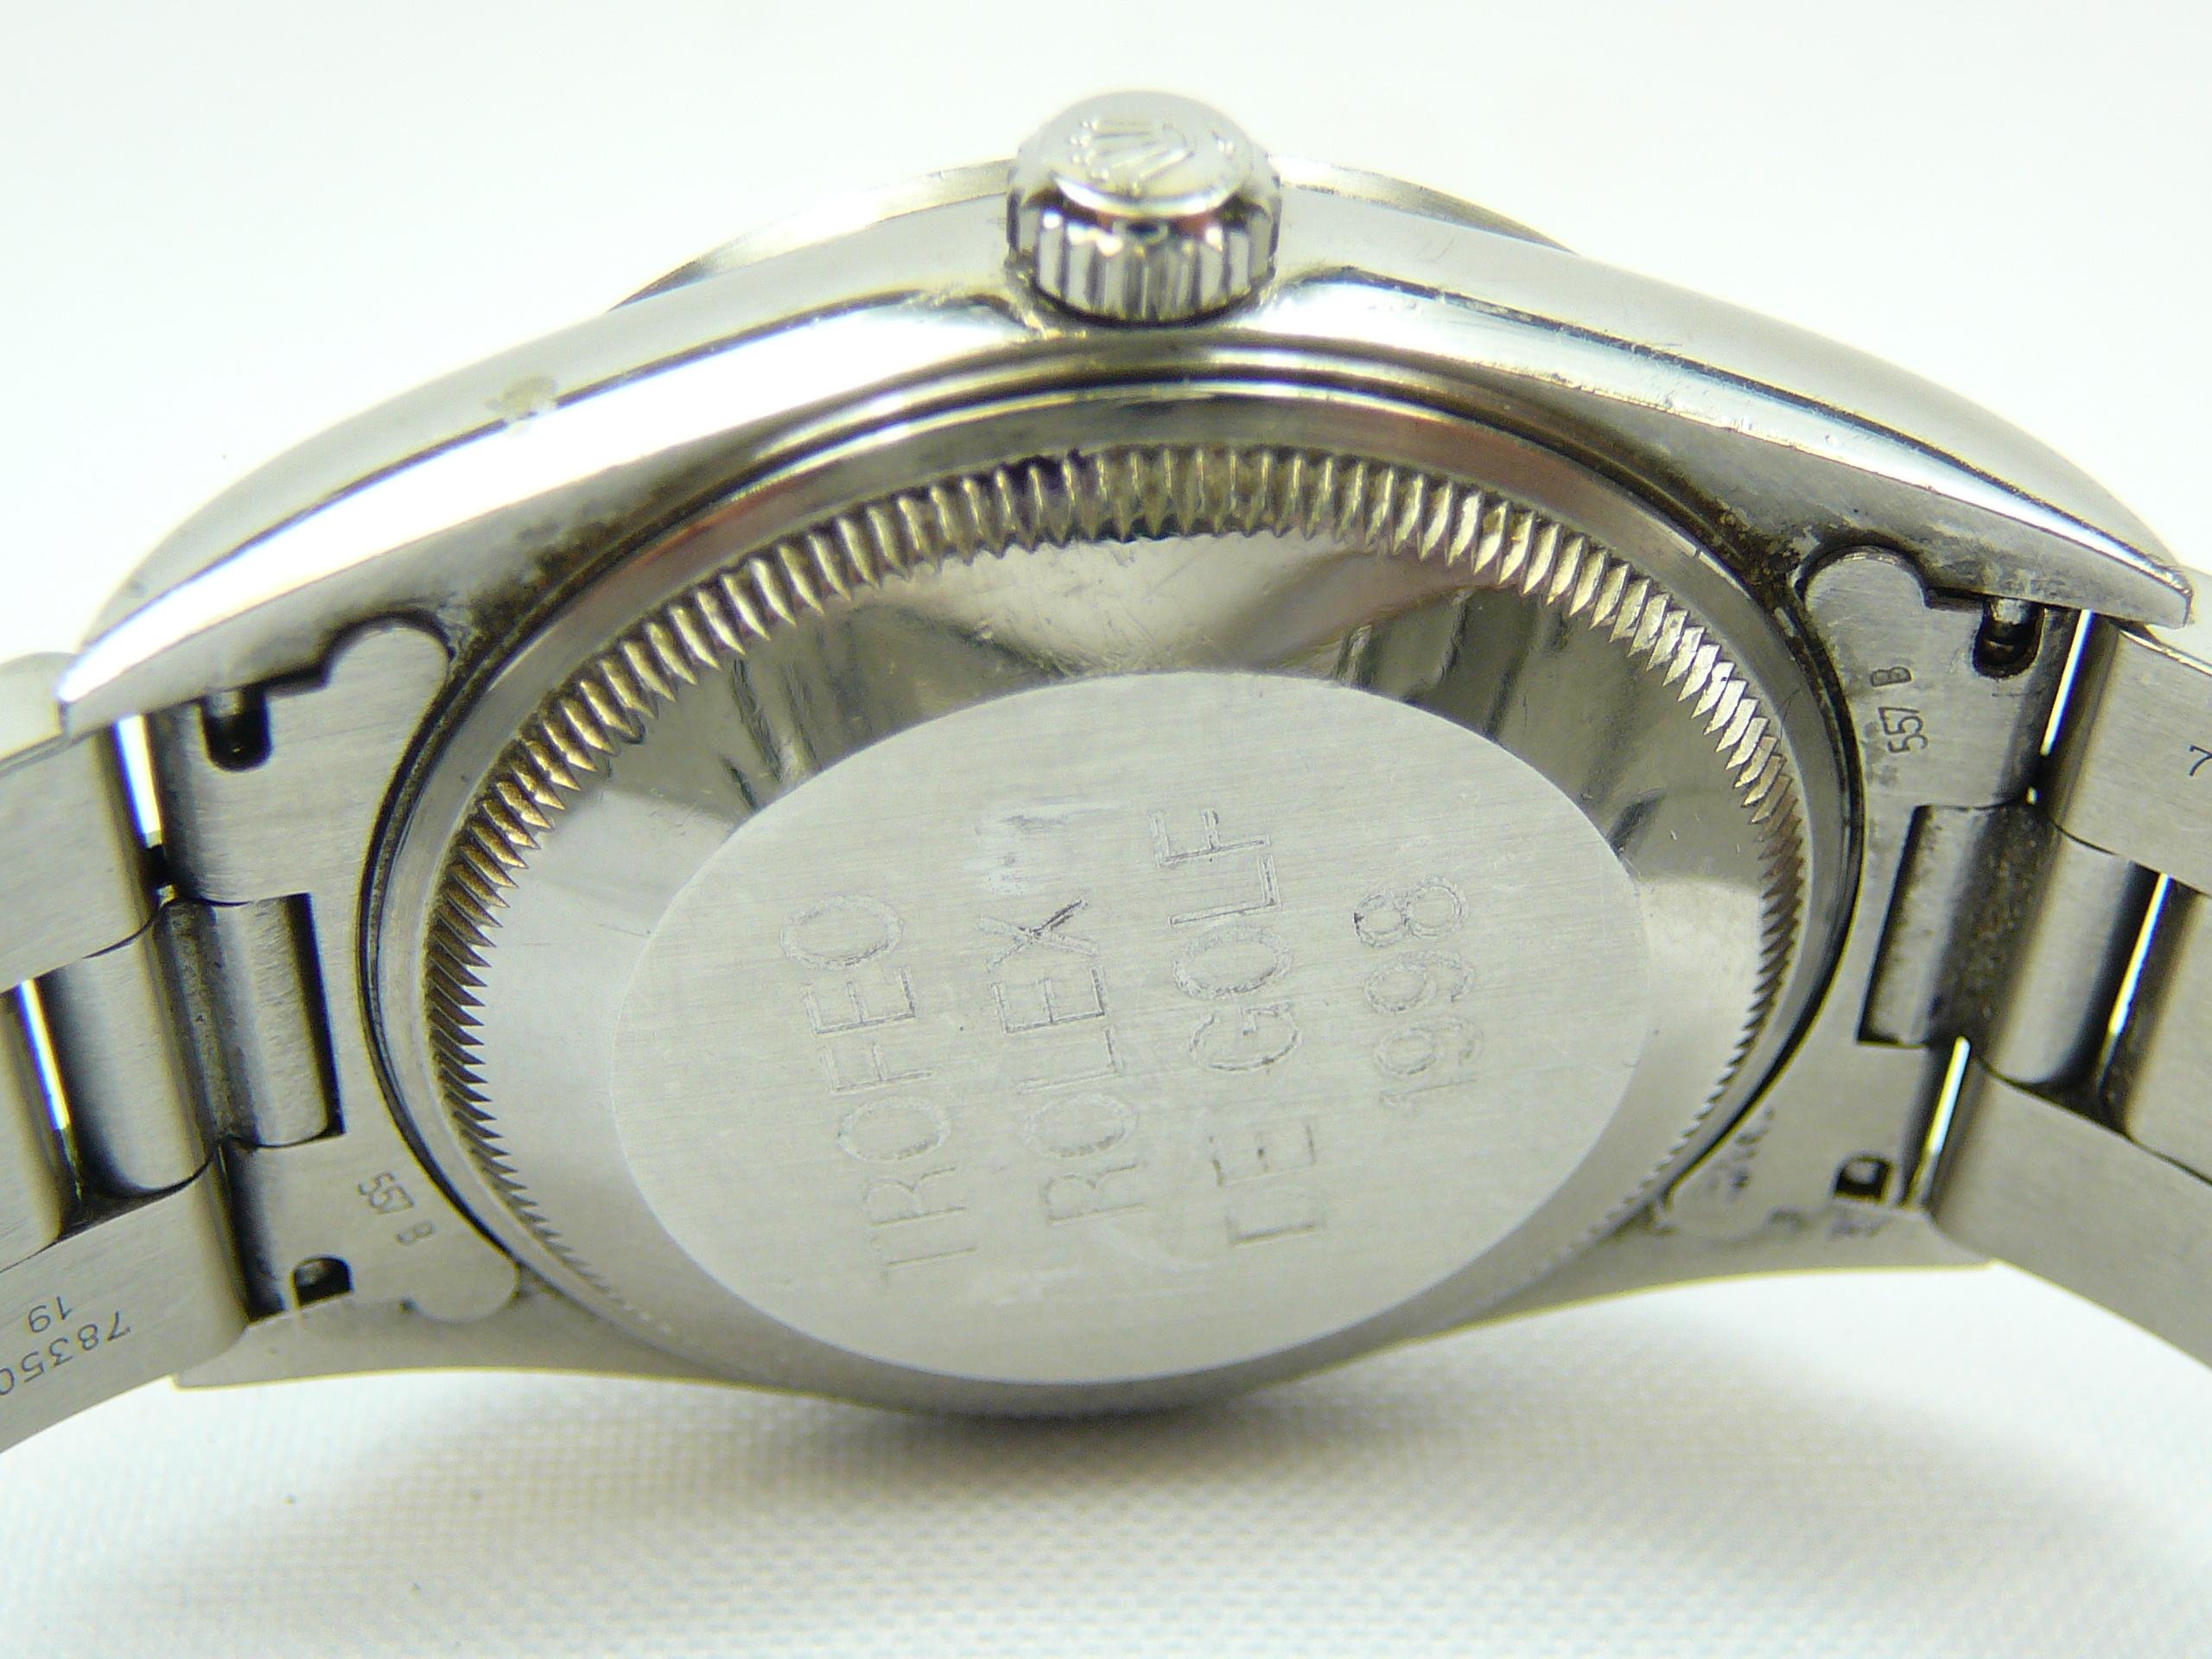 Lot 7 - Gents Rolex wrist watch